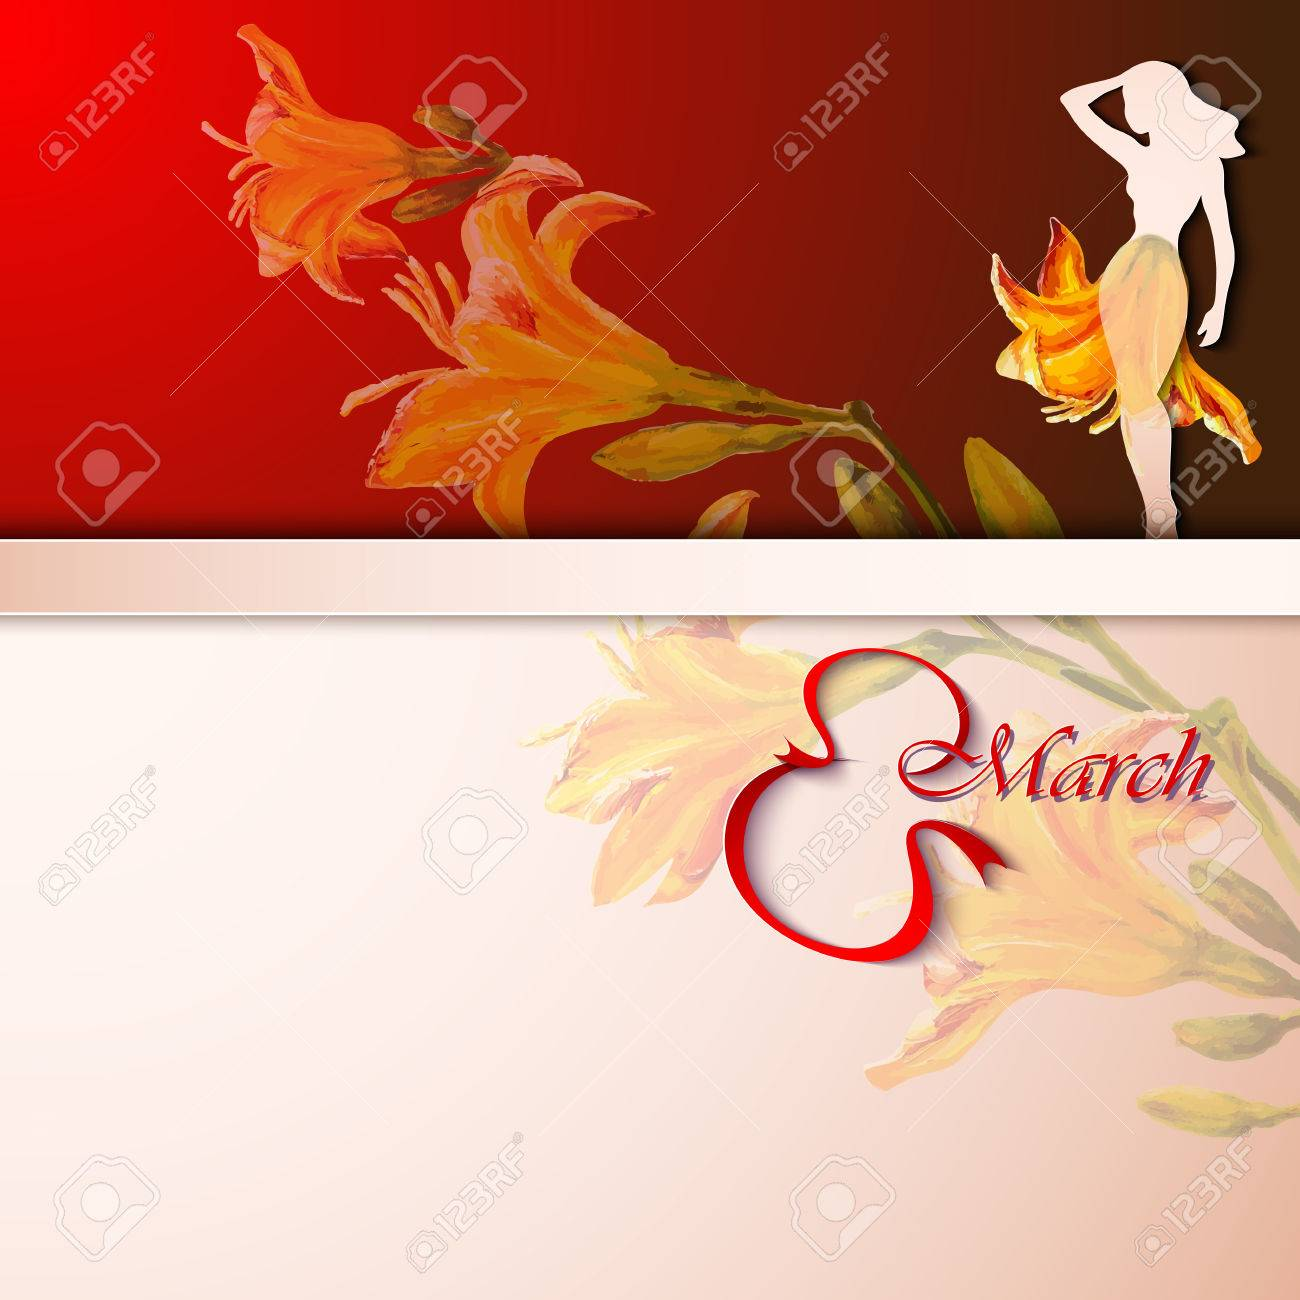 flower invitations templates free - Vatoz.atozdevelopment.co